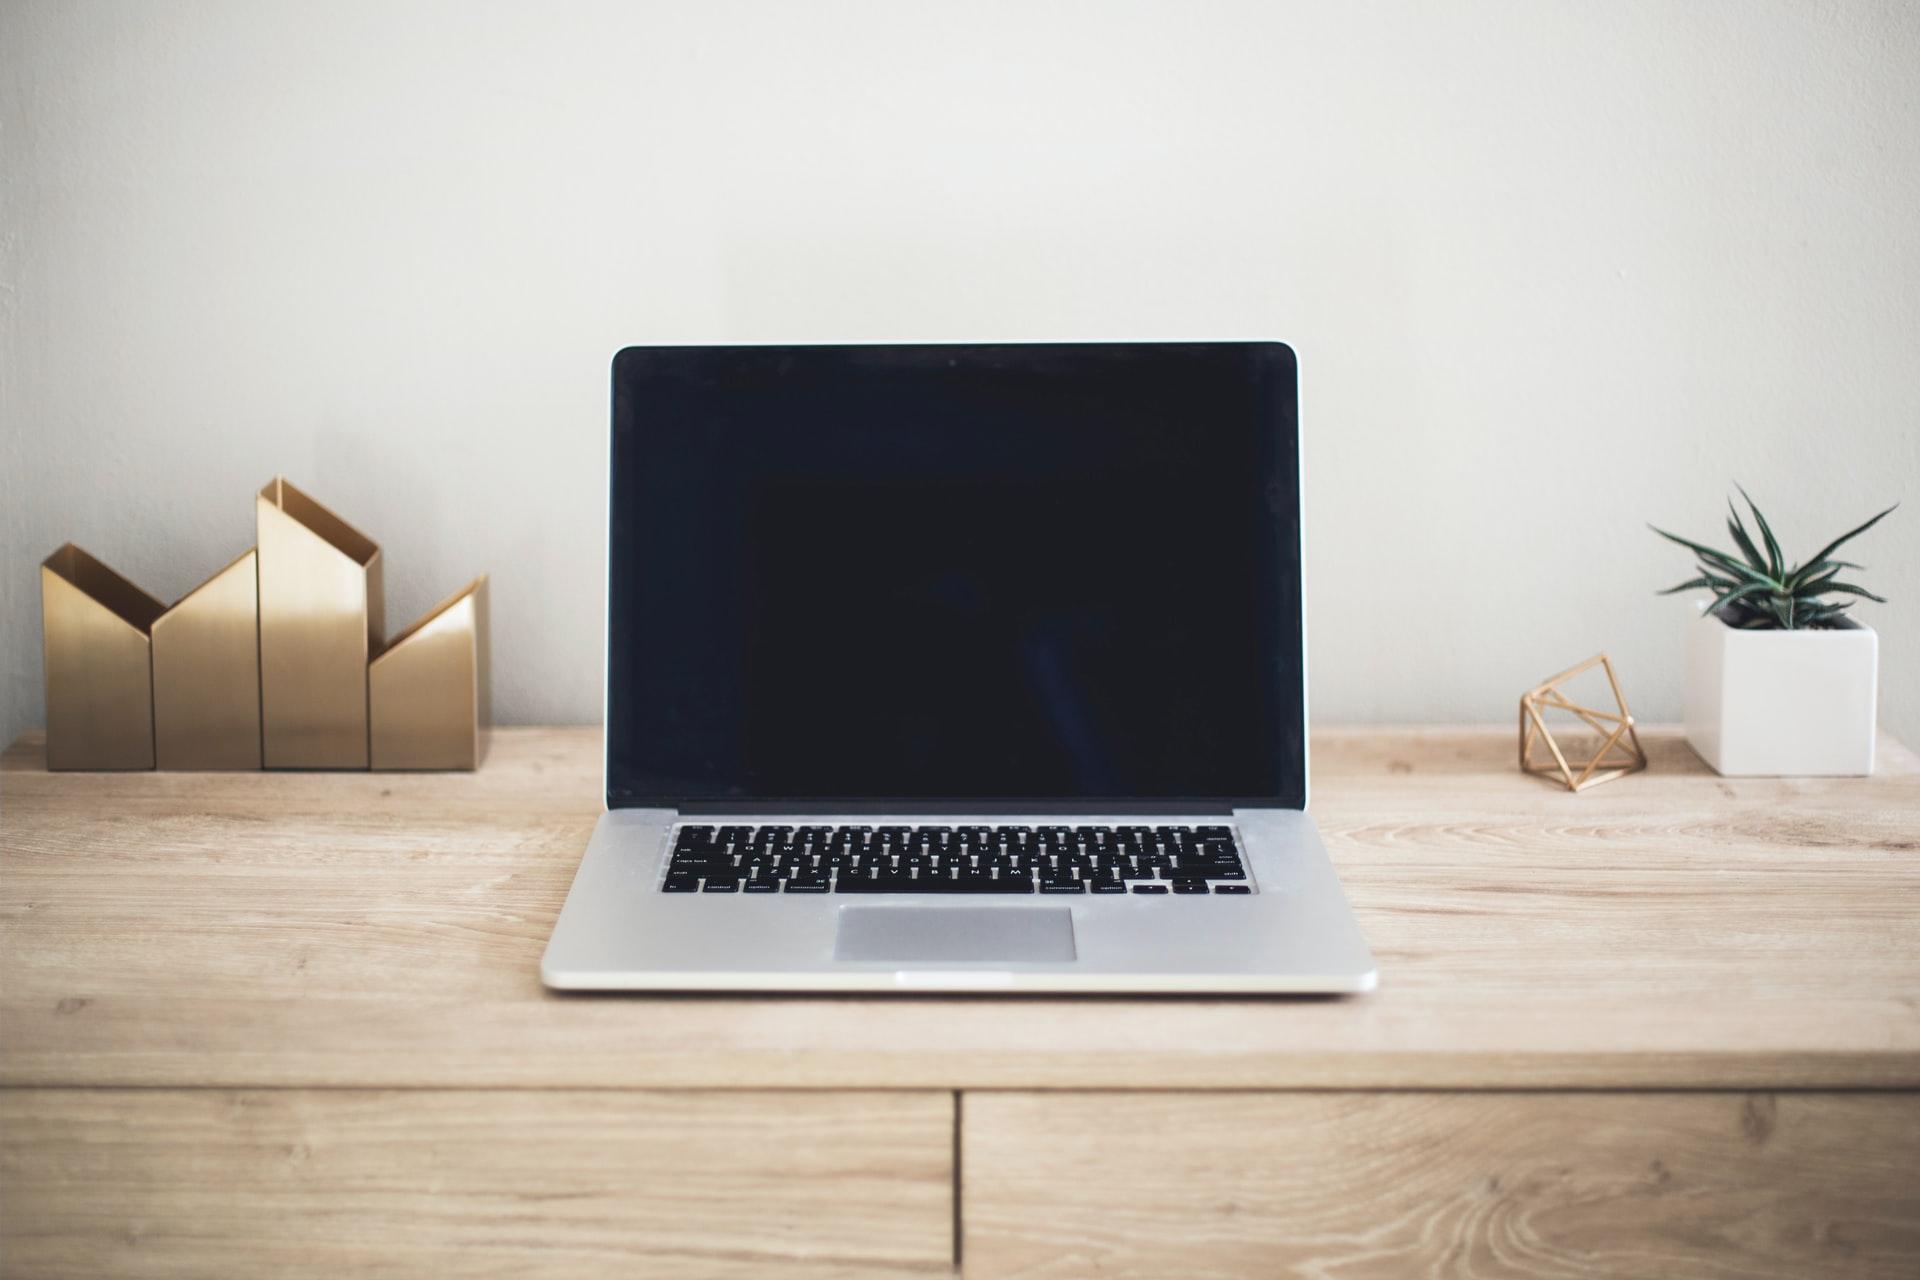 De perfecte laptop vinden doe je zo